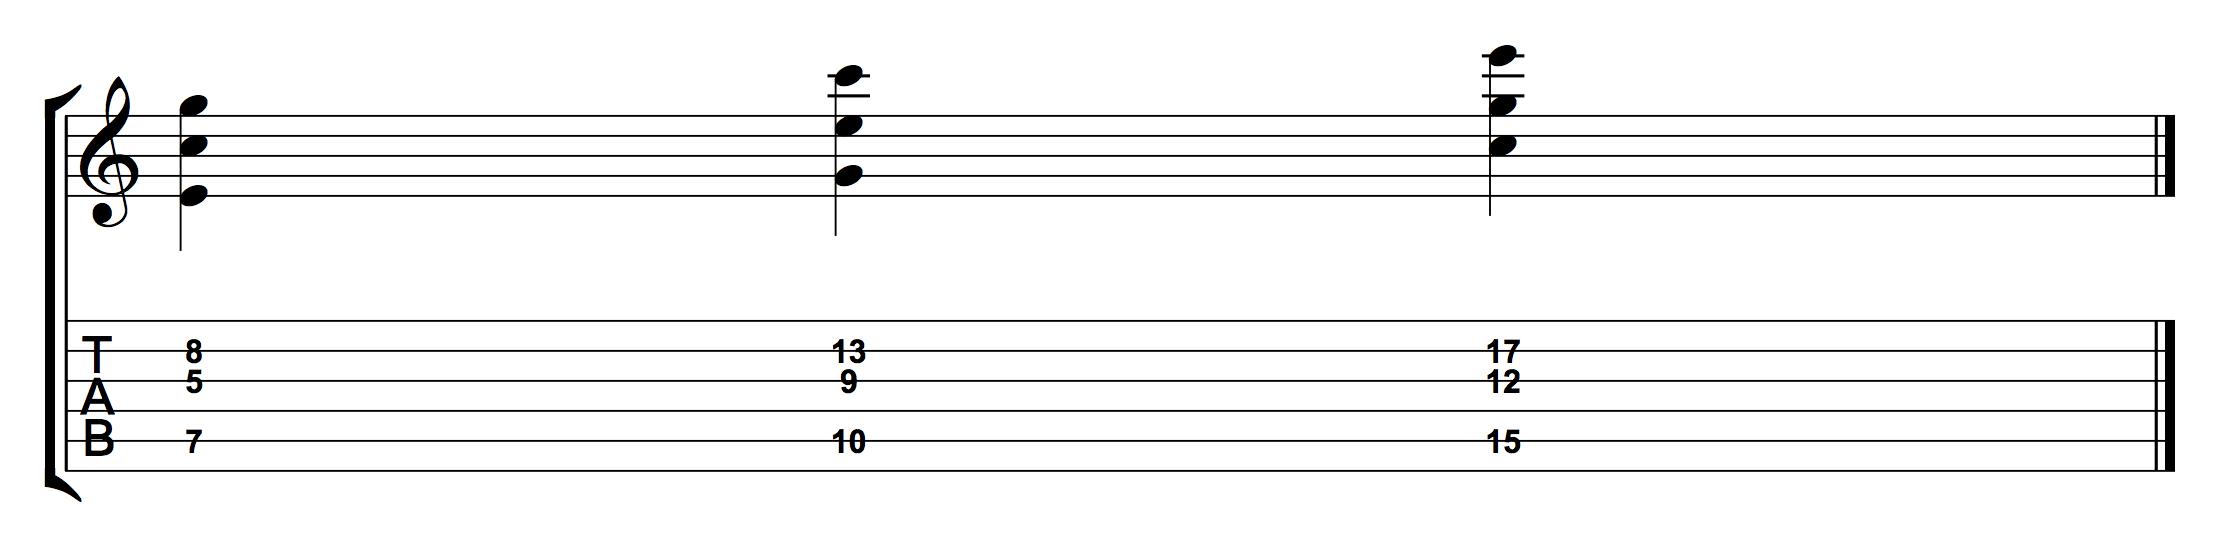 C Major Triad 3 Shapes 235